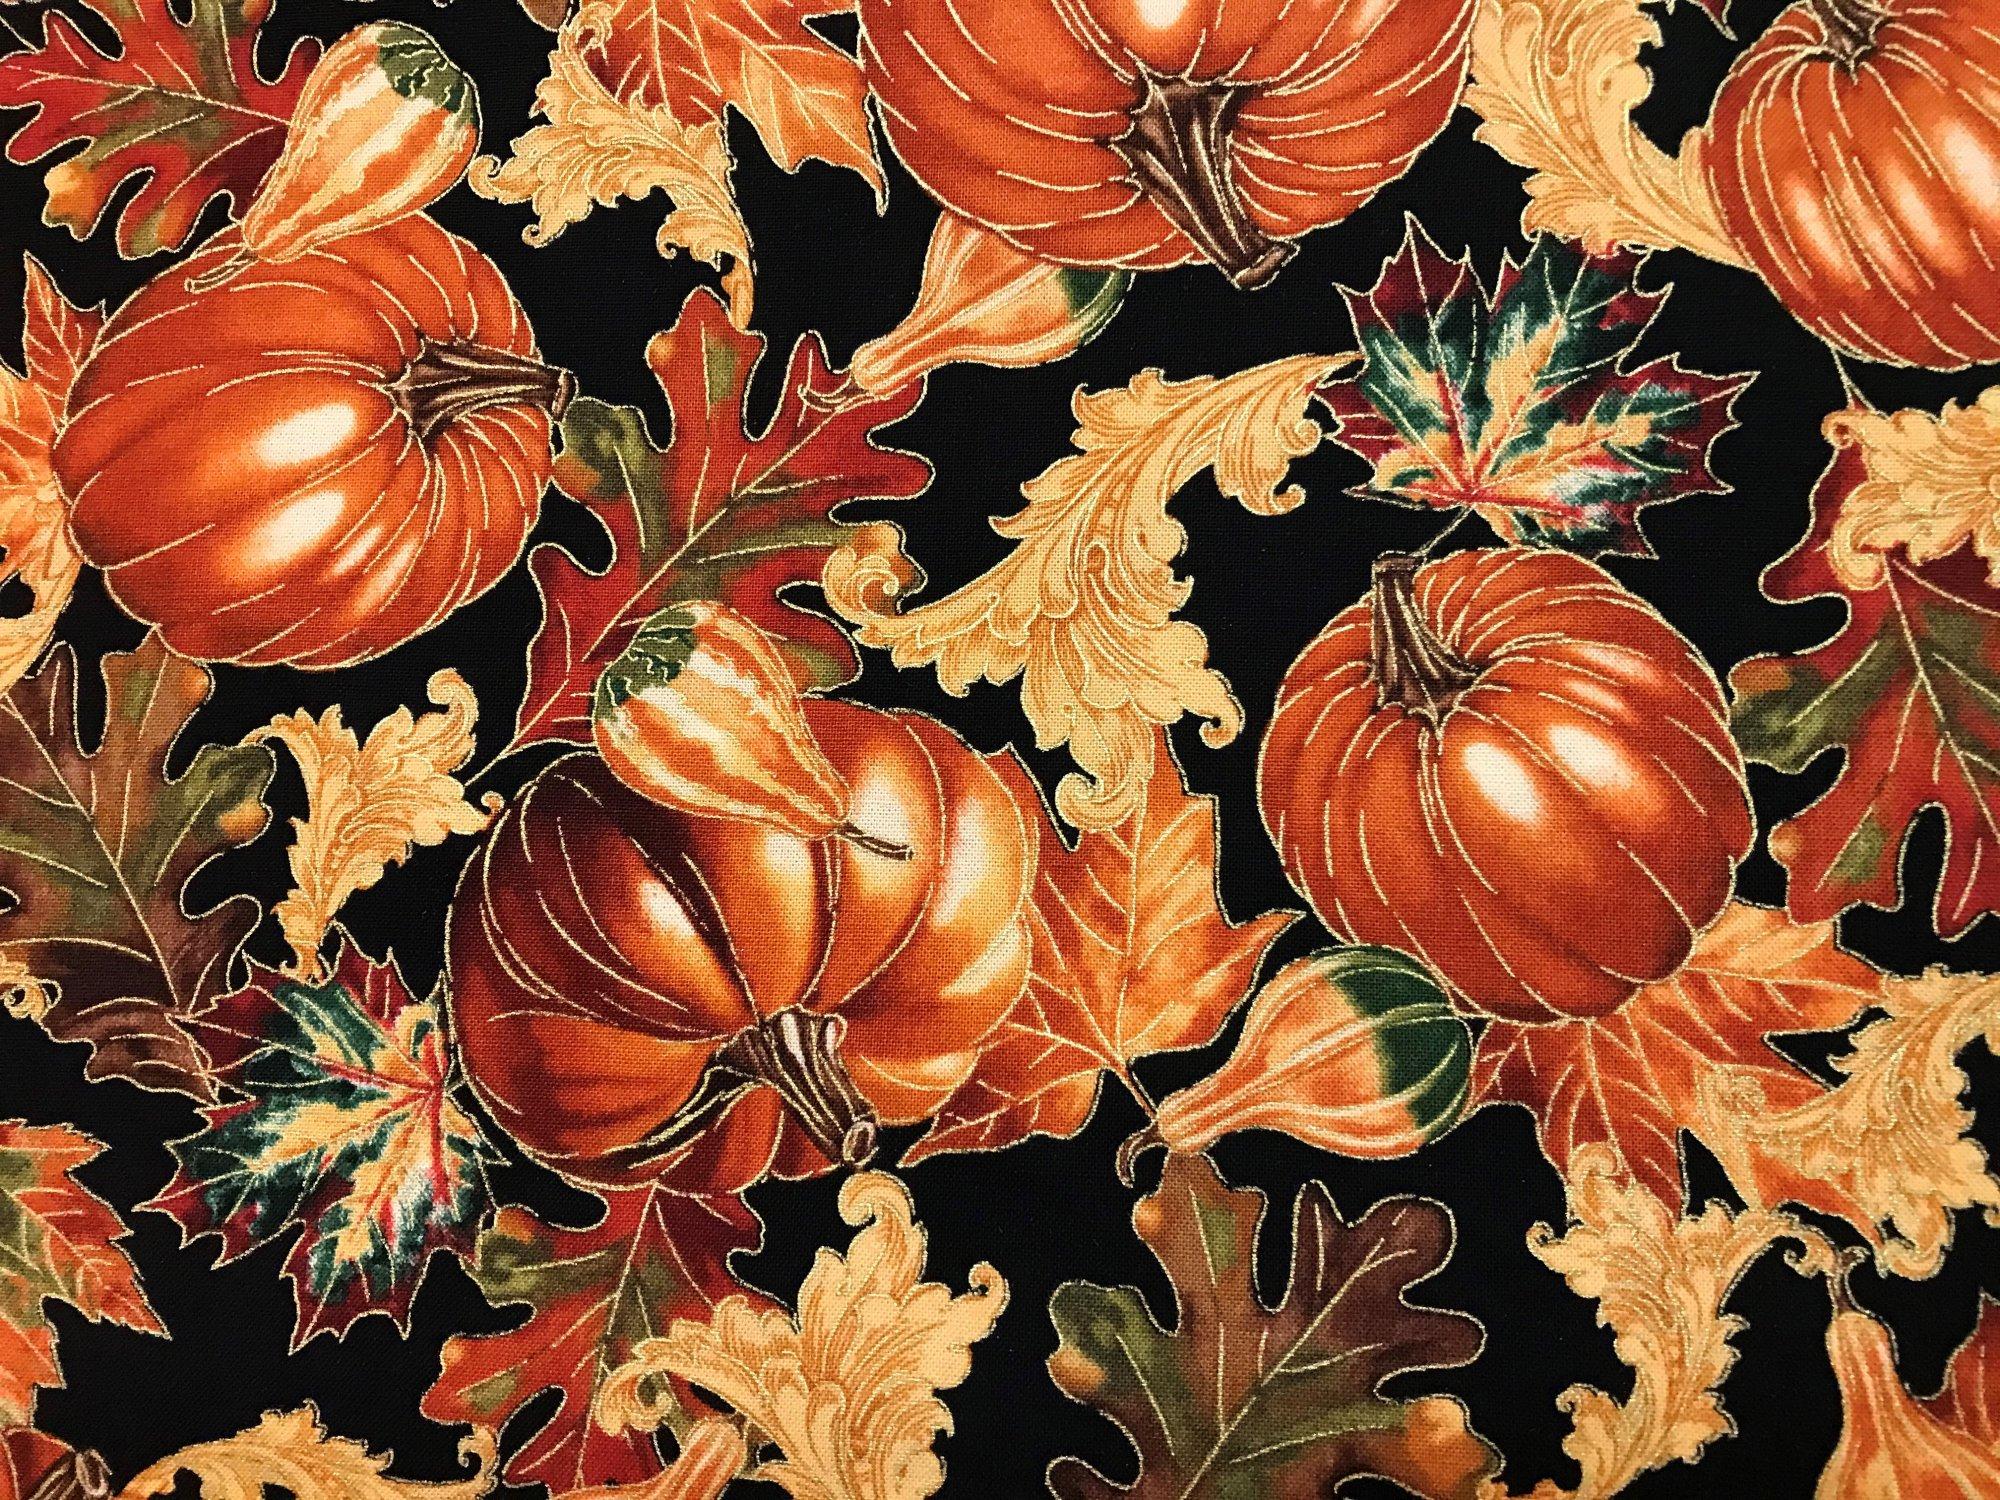 Fall Harvest Pumpkin & Leaves metallic CM2090